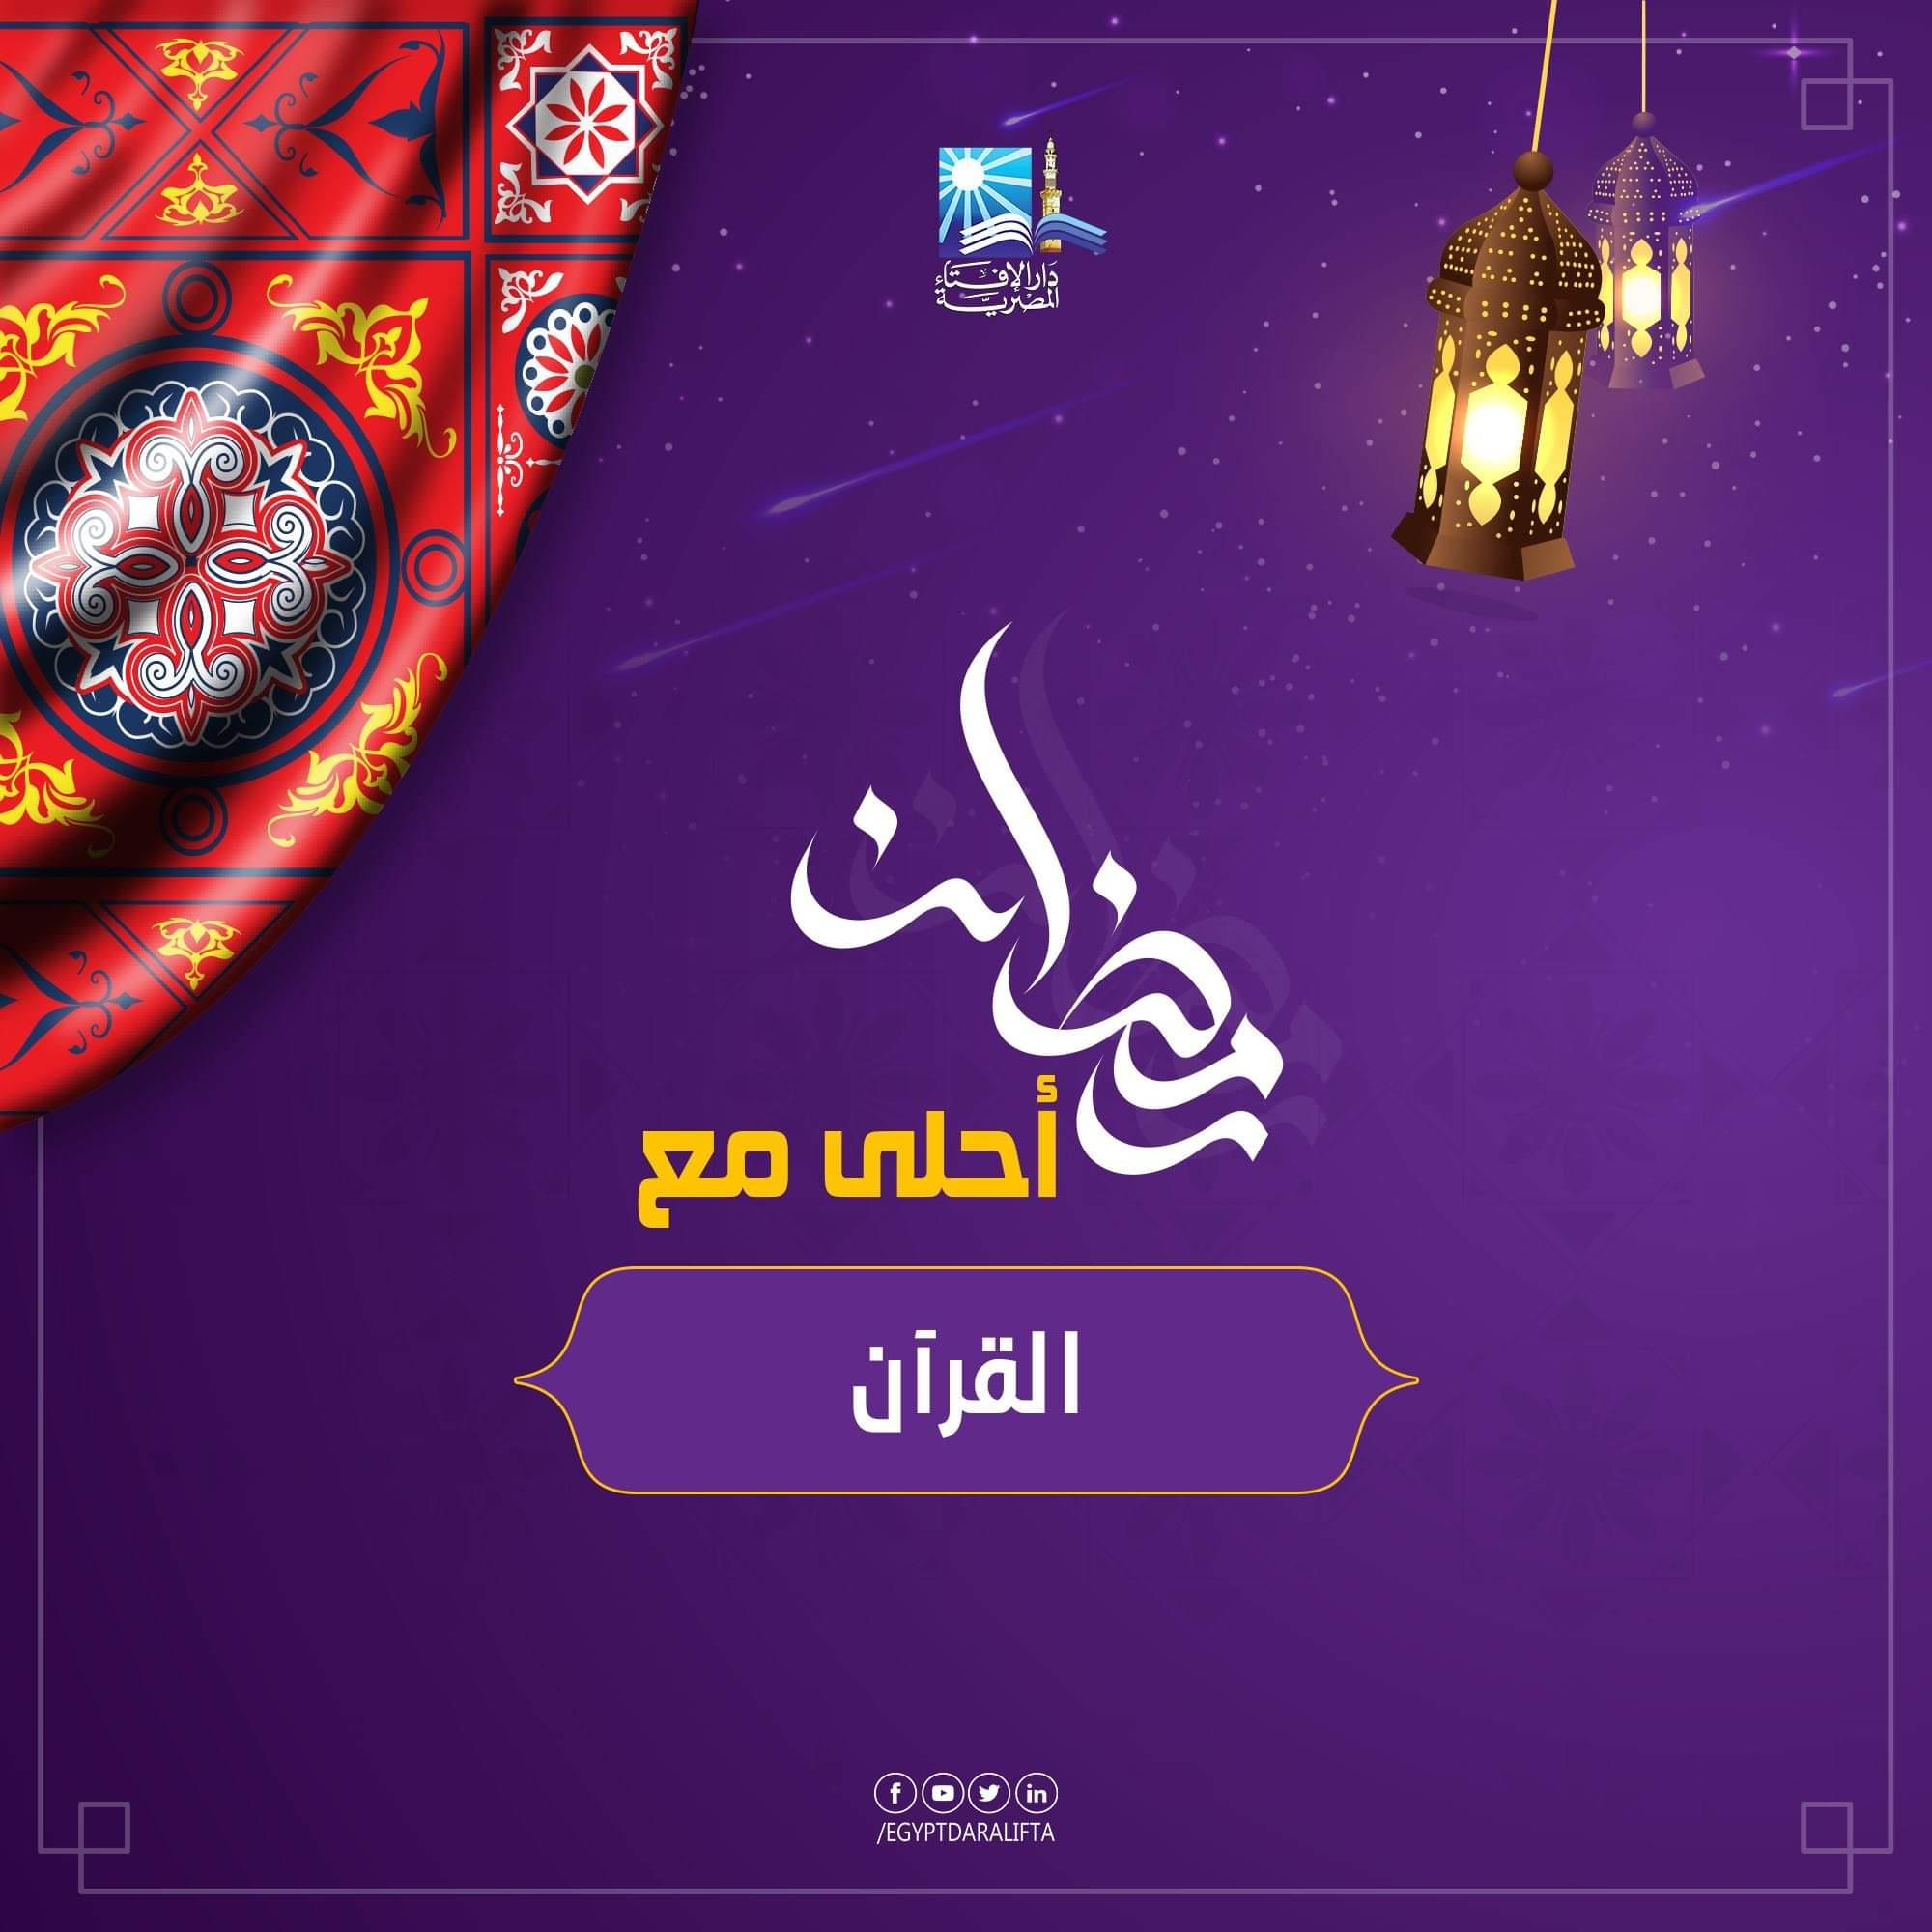 صور رمضان 2020 أجمل صور فوانيس رمضان 2021 بطاقات تهنئة لرمضان تهنئة رمضان بالأسماء 25